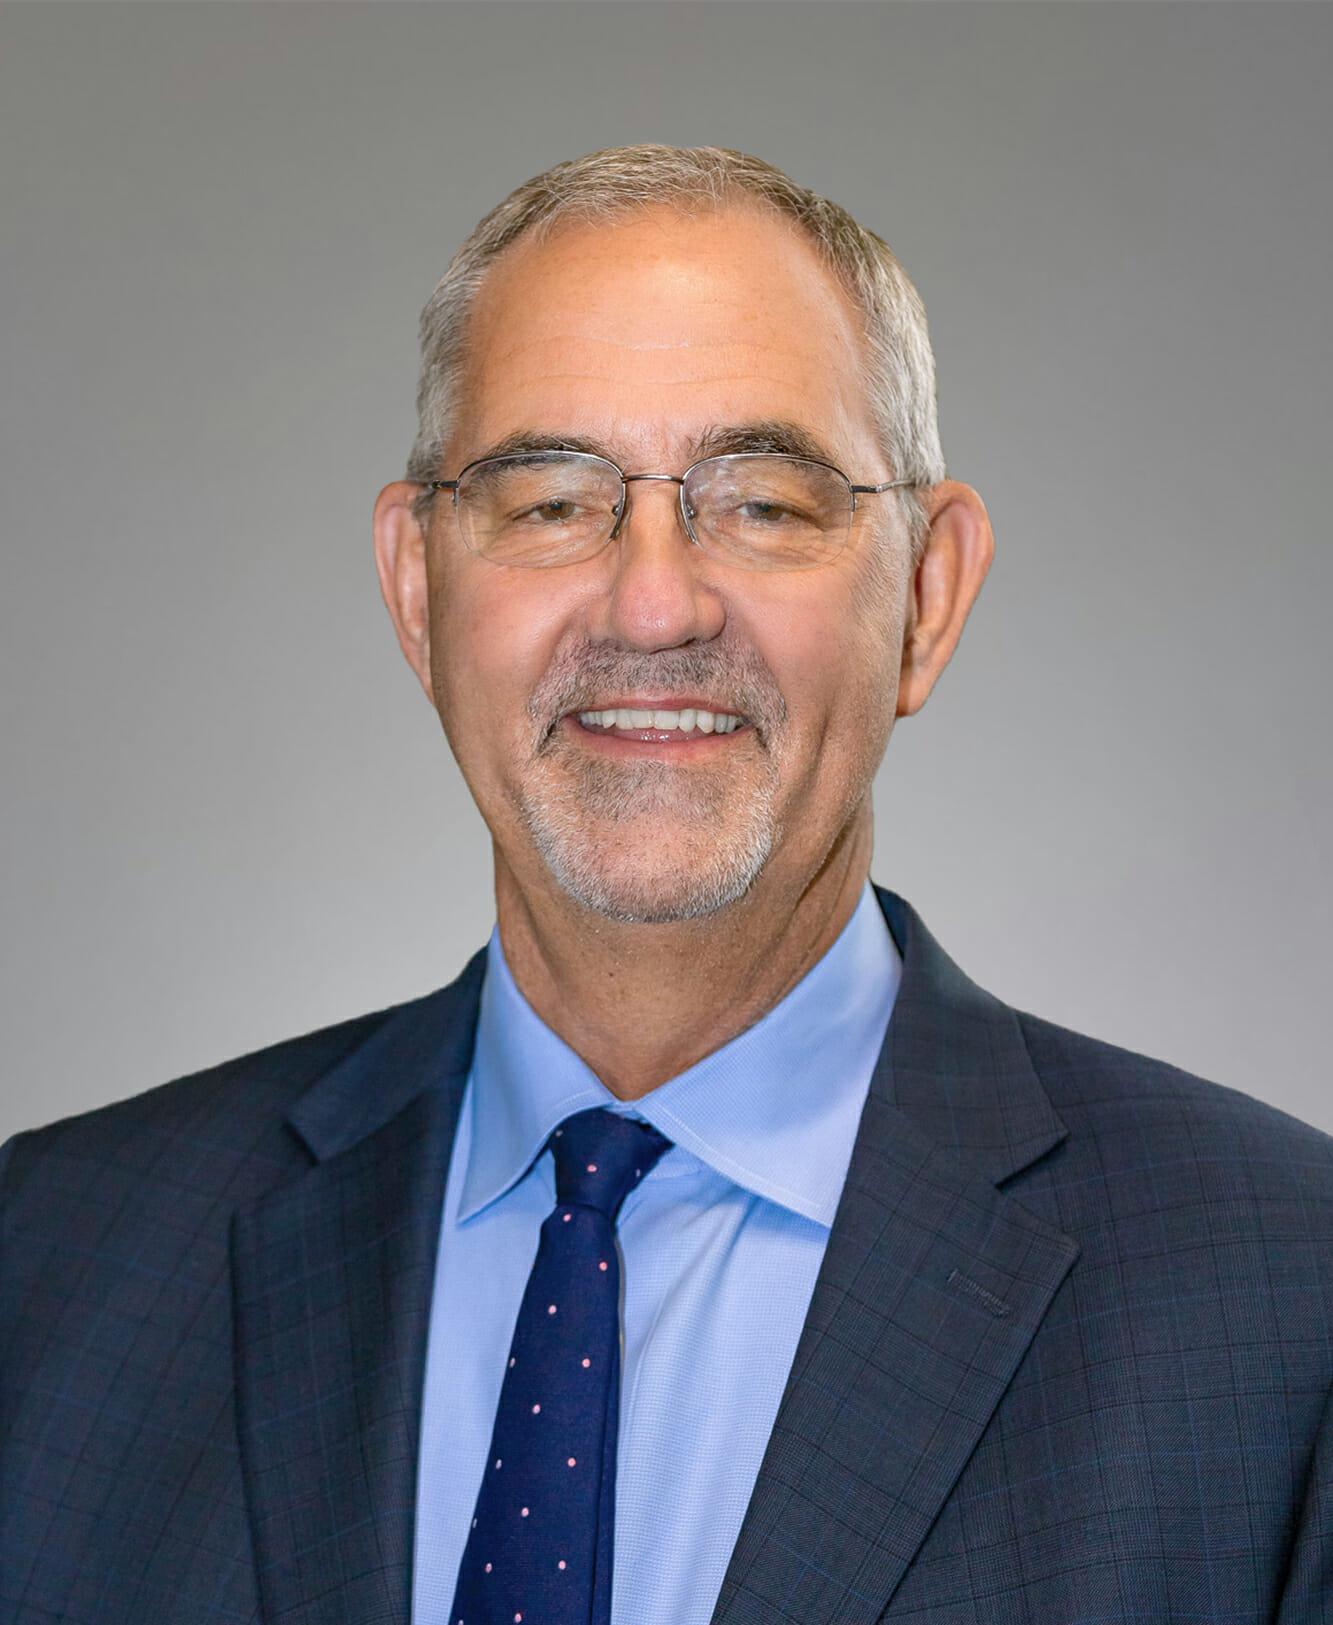 Tom Stringfellow, CFA®, CFP®, CPA